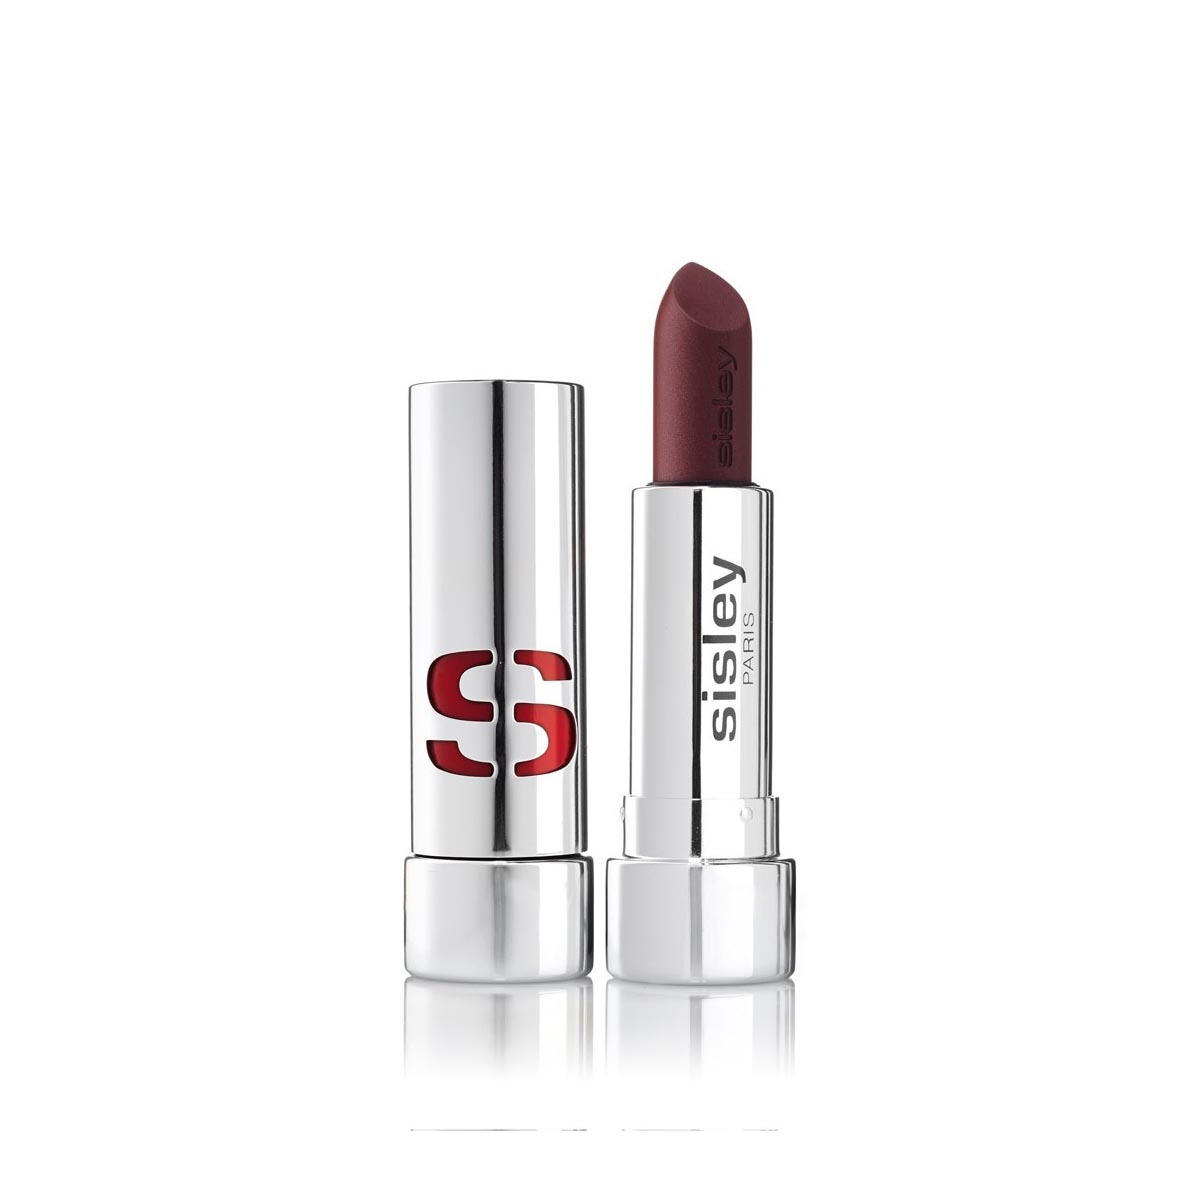 Sisley phyto lip shine sheer 12 sheer plum